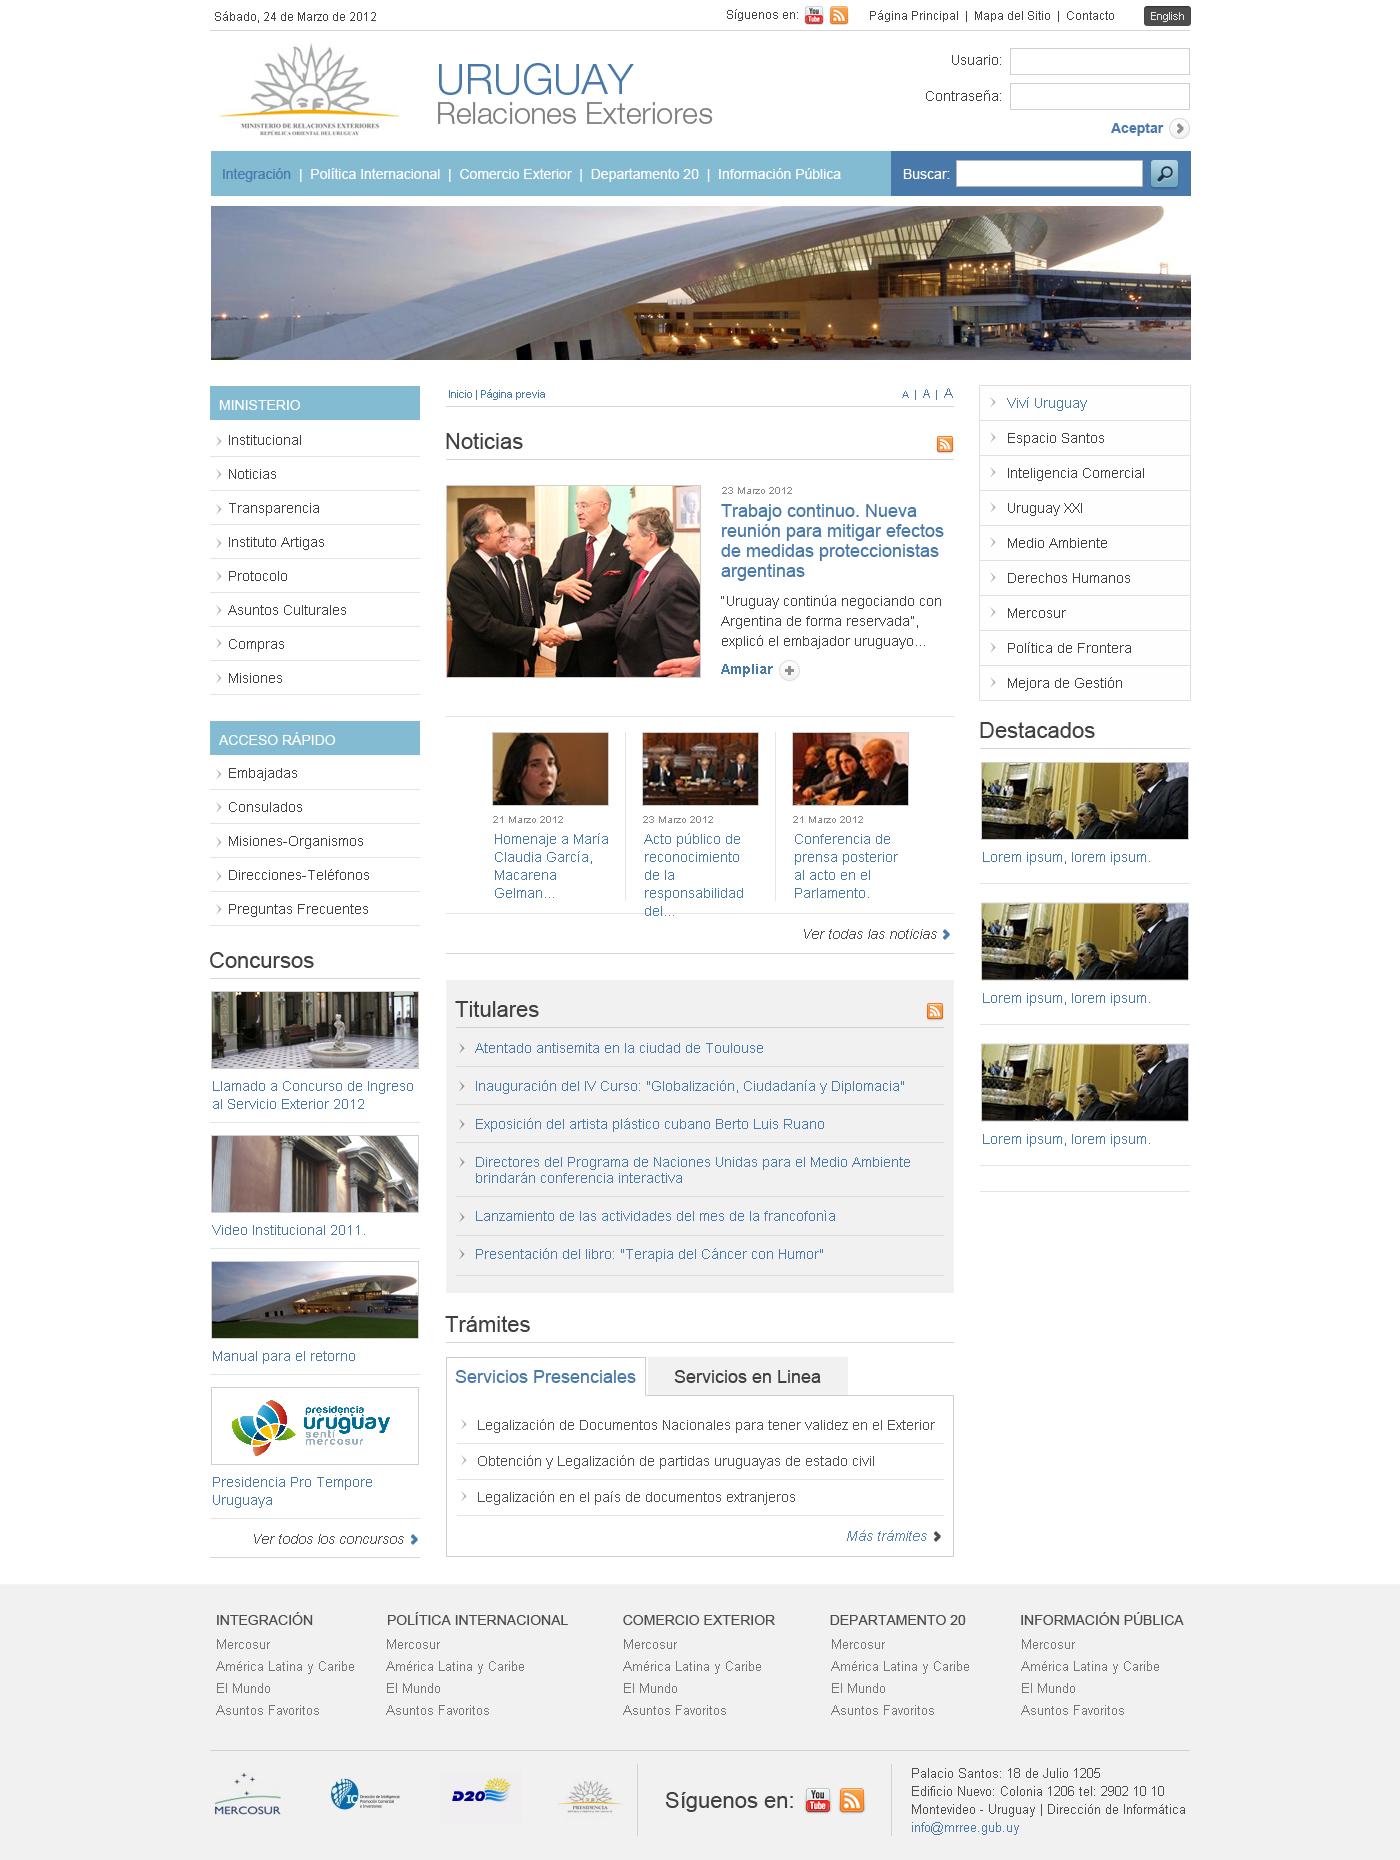 Ministerio de relaciones exteriores actotal for Pagina web ministerio interior